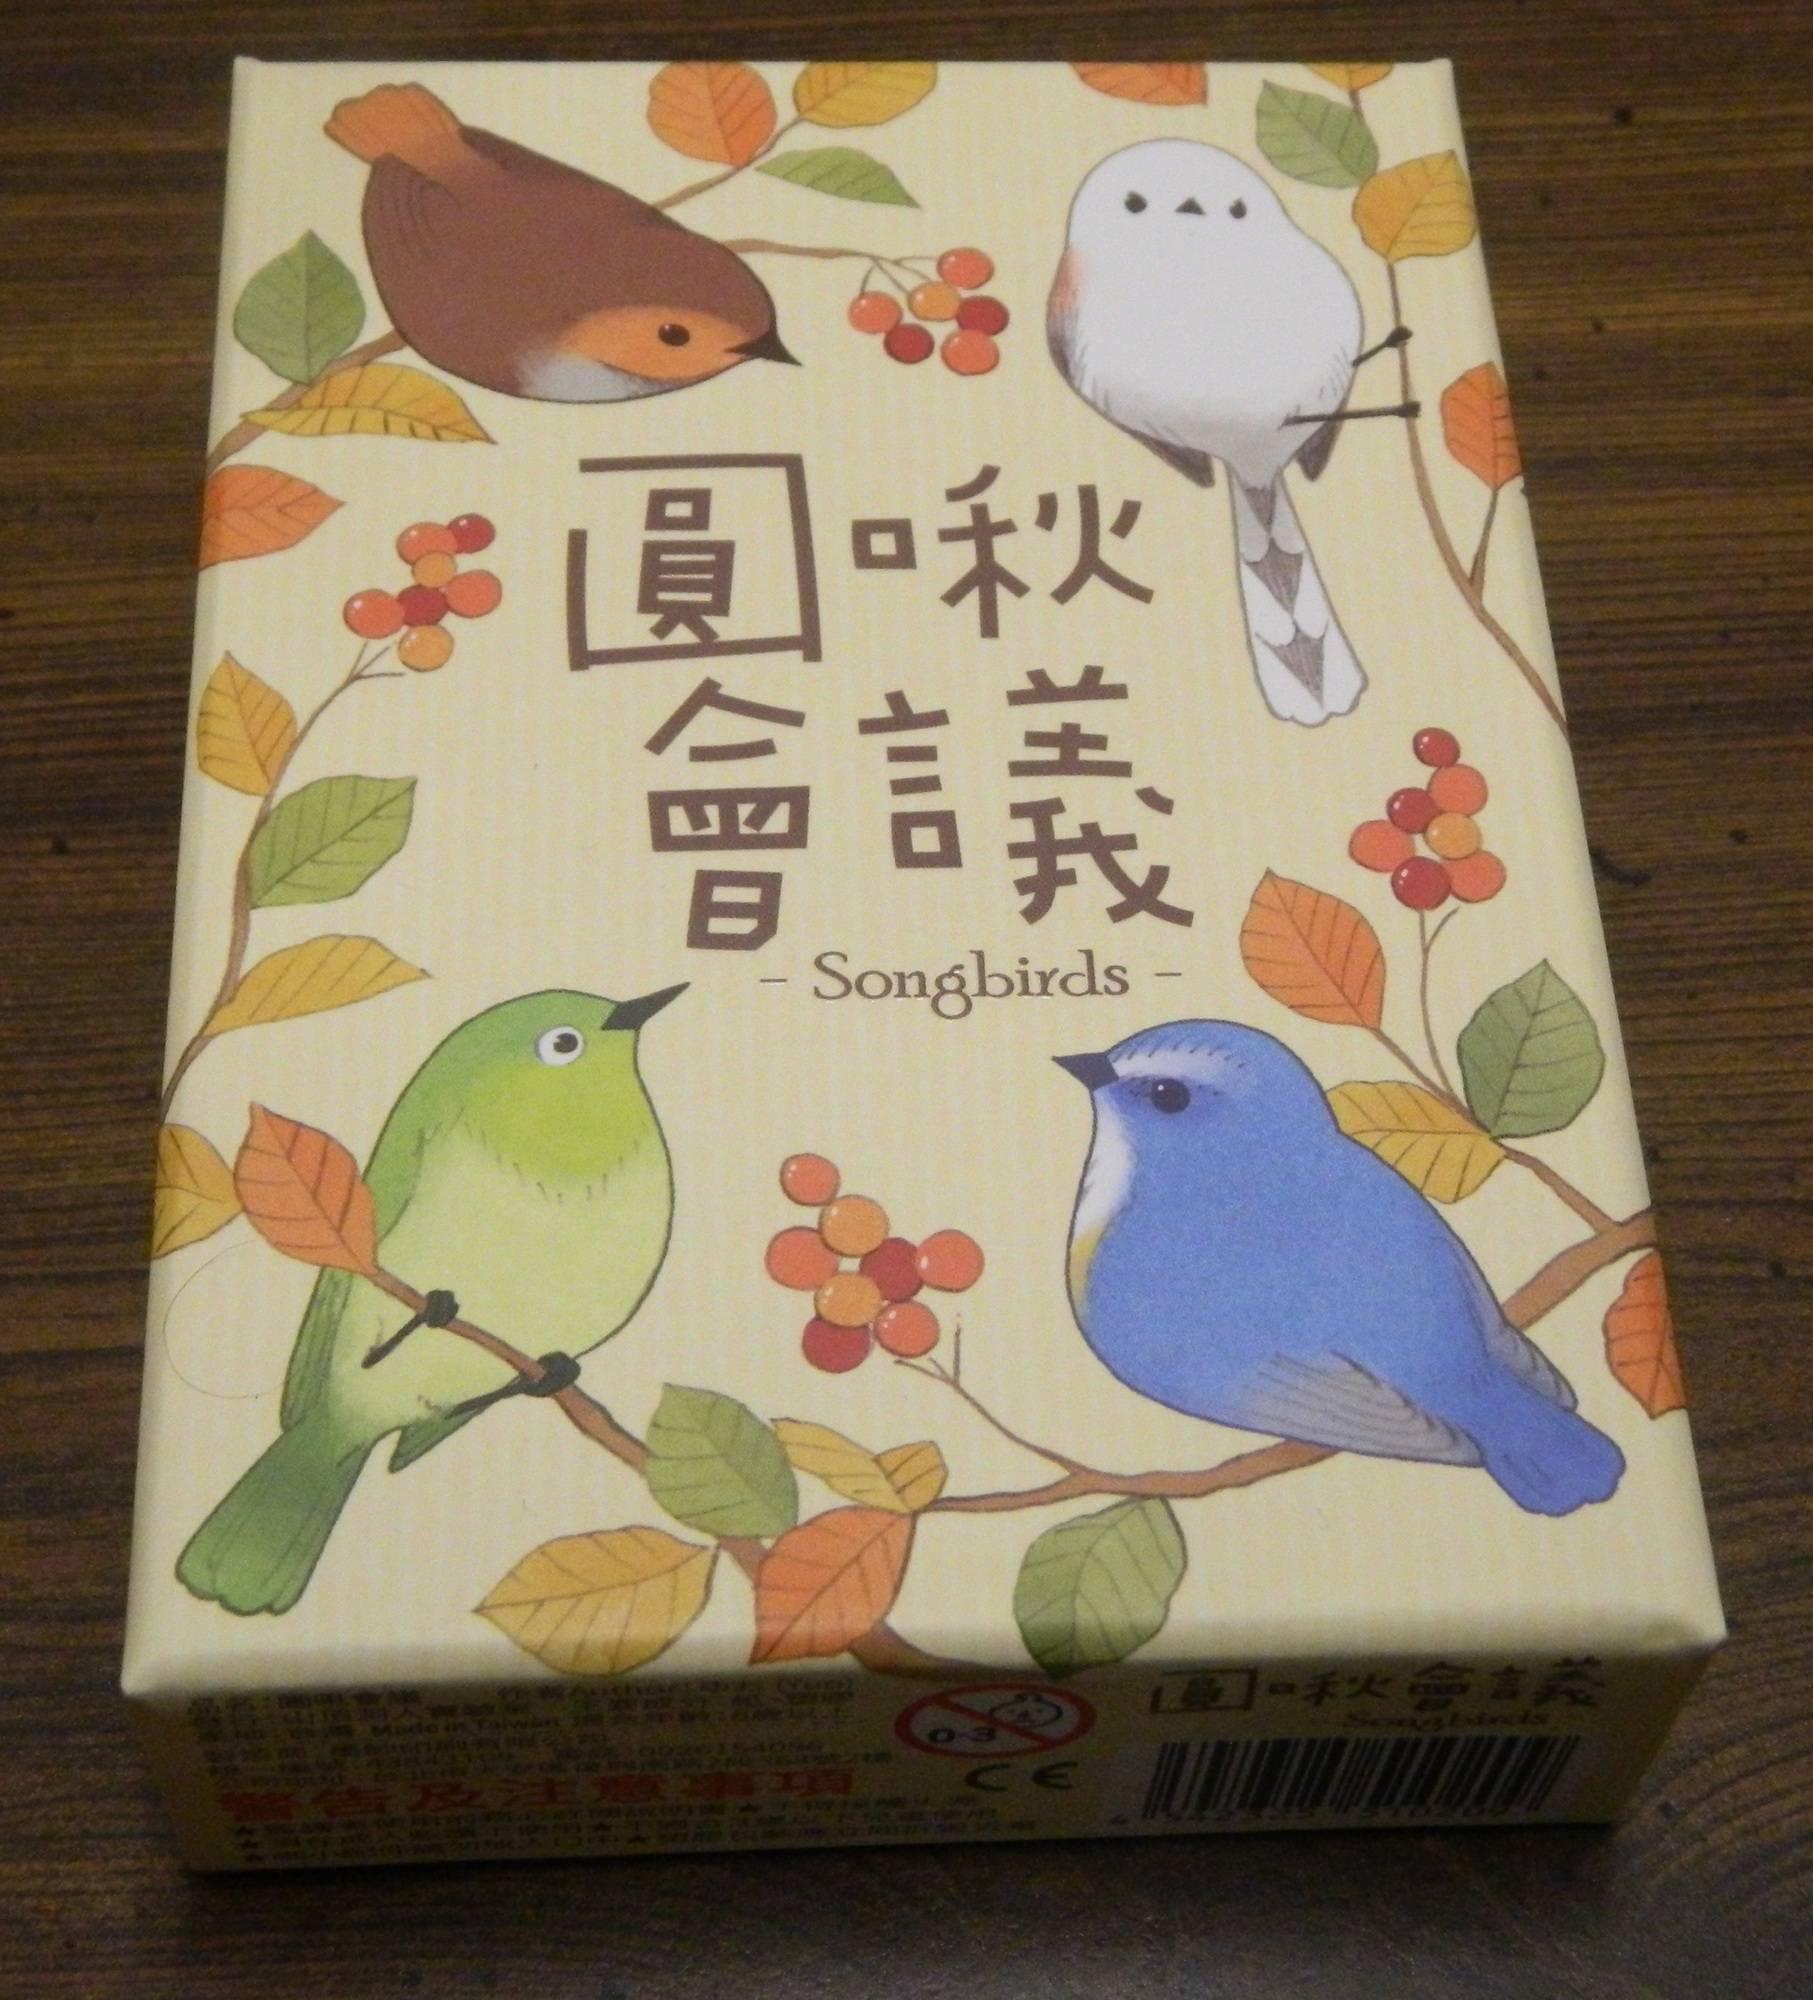 Box for Songbirds